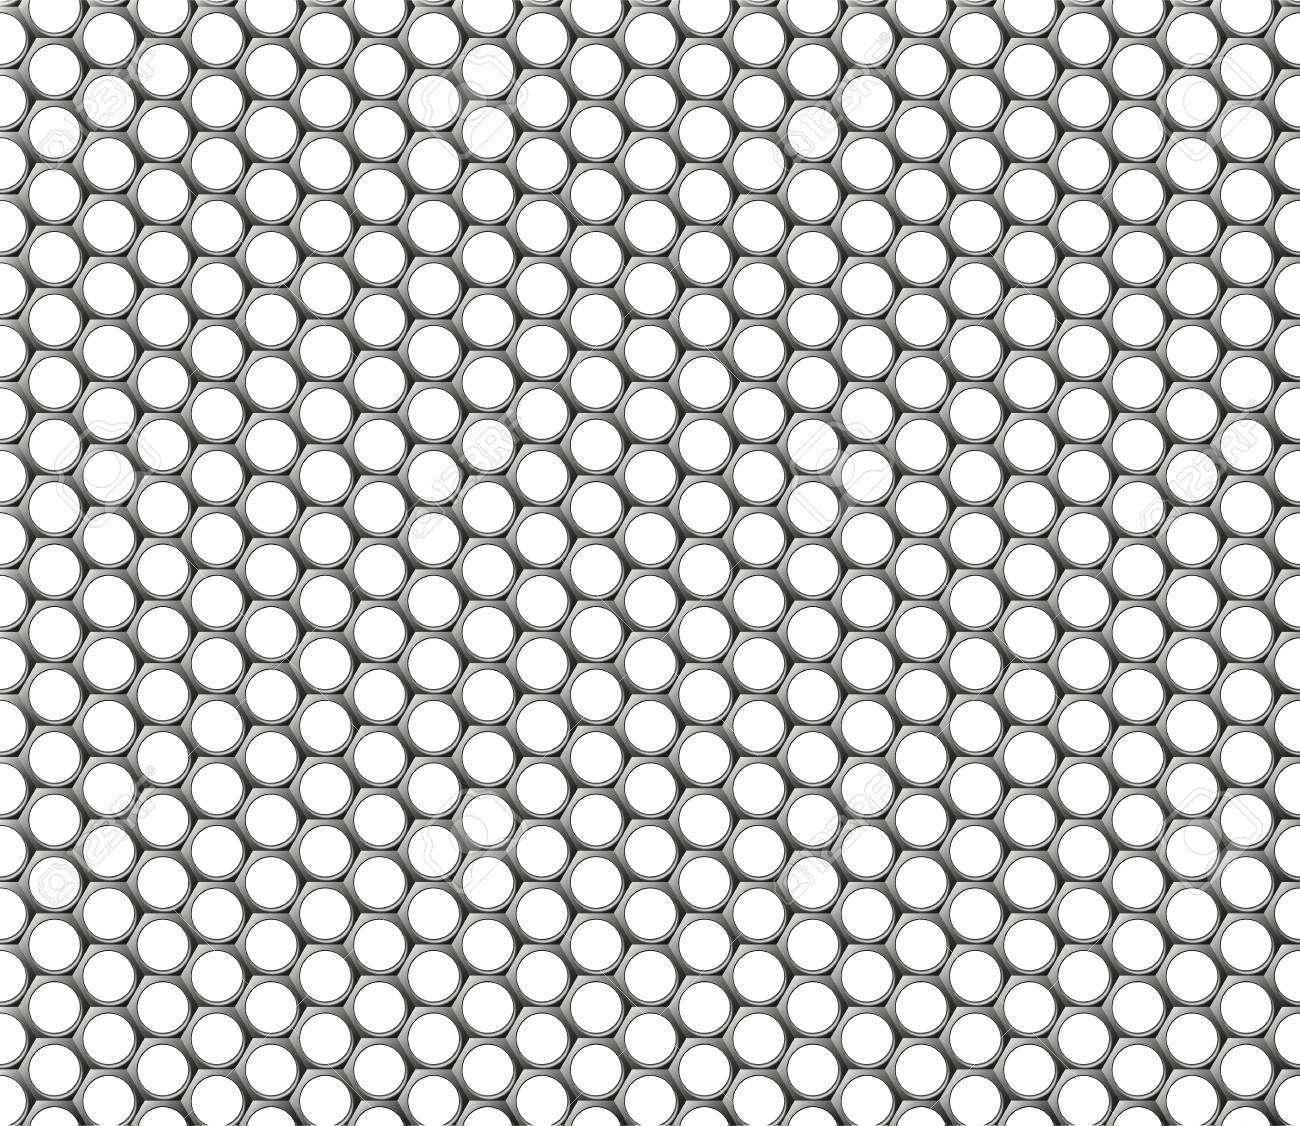 Hexagonal Mesh Series Manufacturers